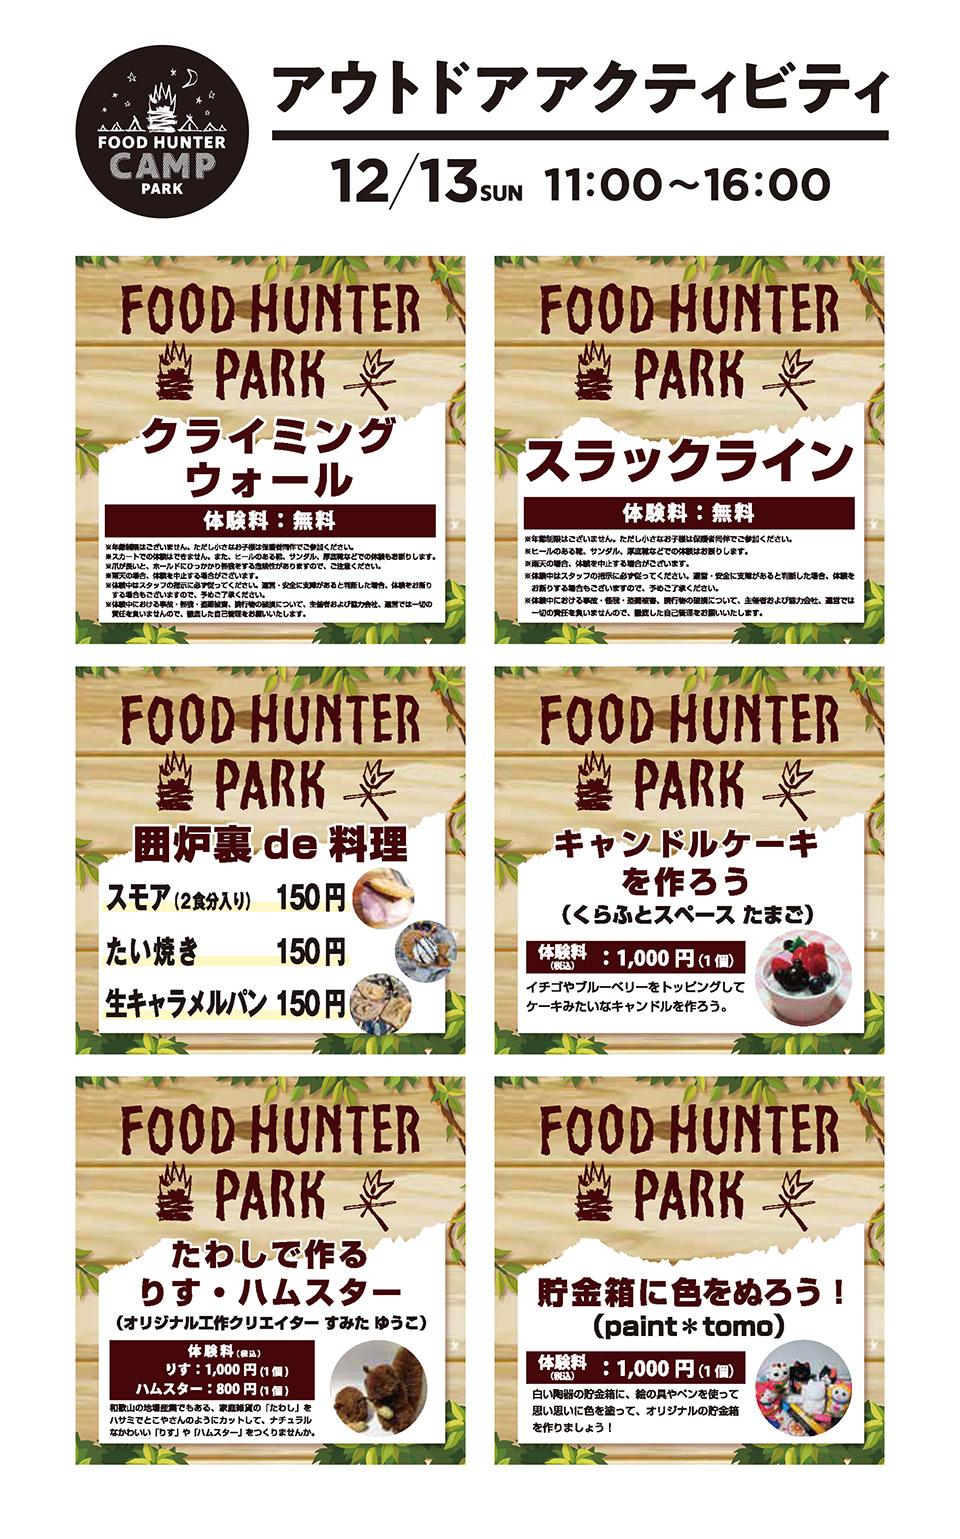 FOOD HUNTER CAMP PARK 第2弾情報解禁